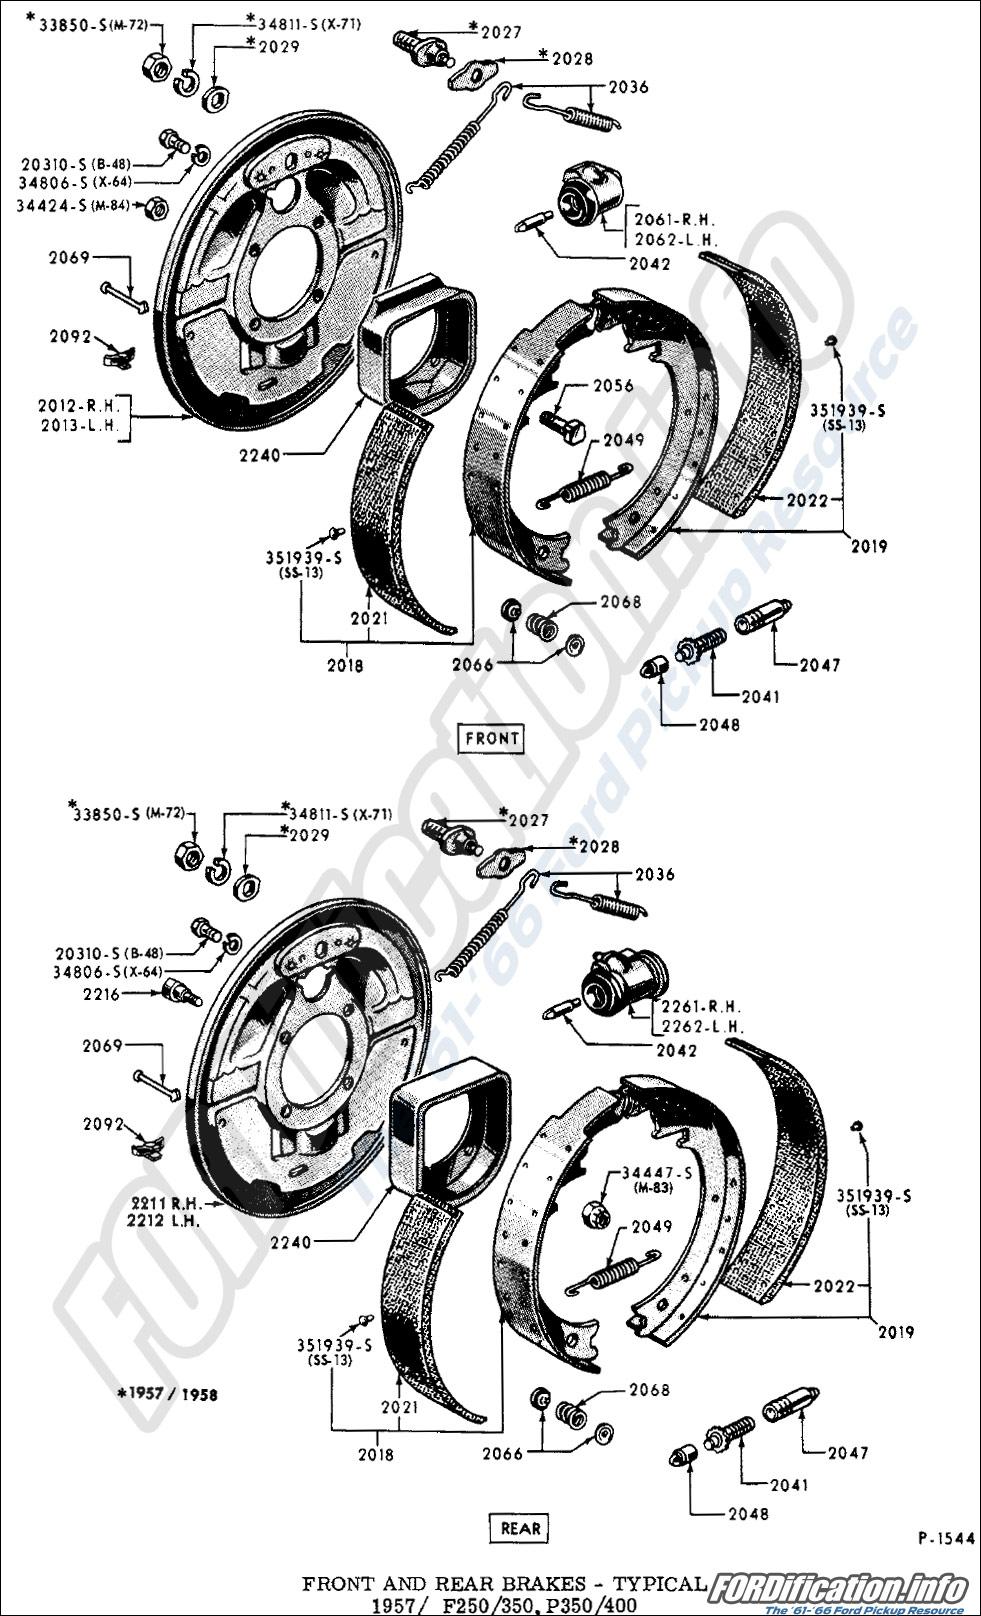 brake system schematics - fordification info